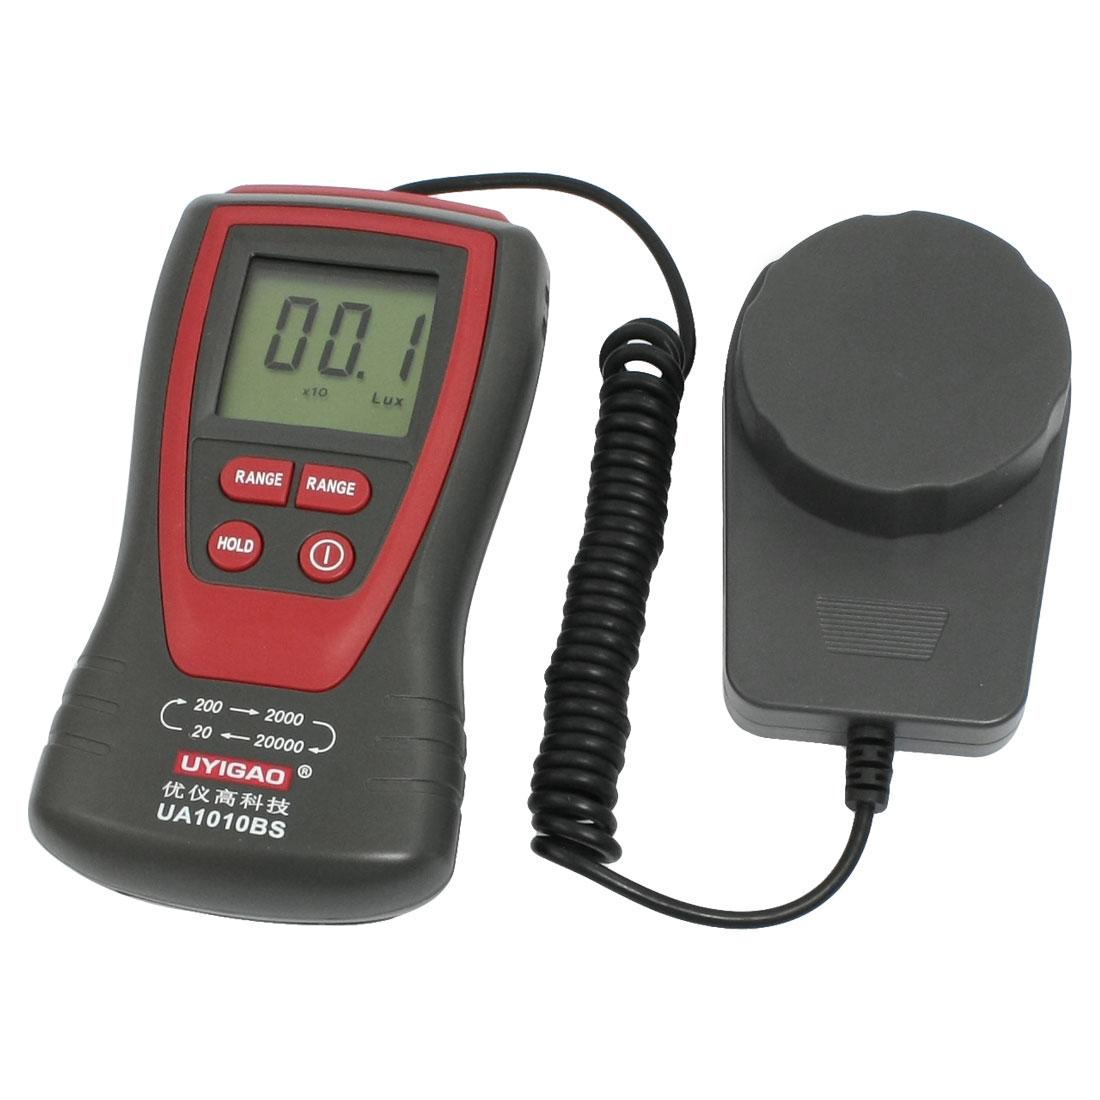 Measurement LCD Display UA1010BS Luxmeter Digital Meter